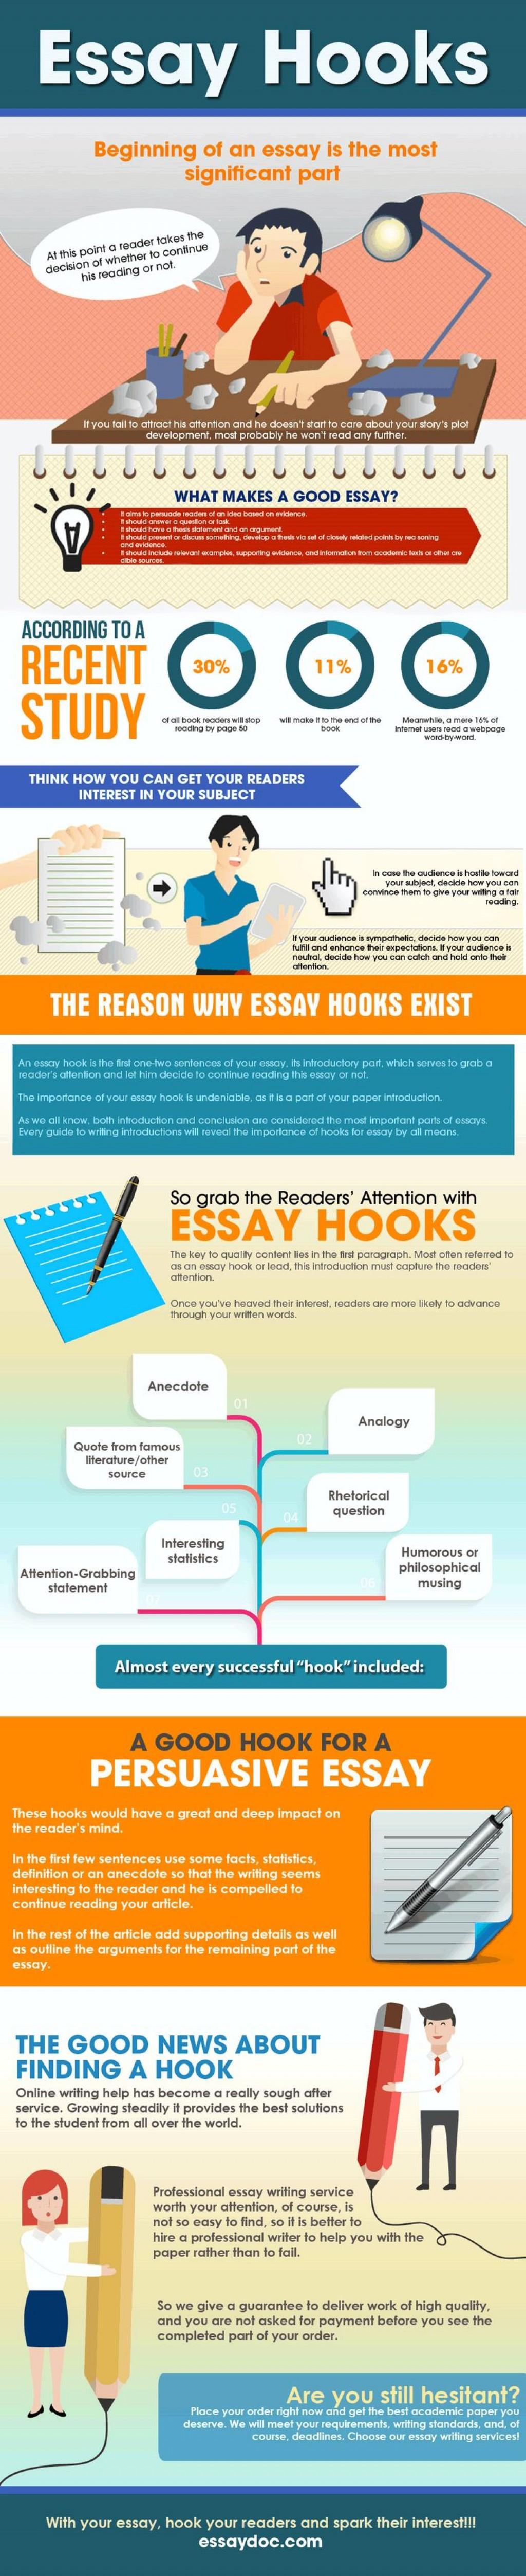 014 Examples Of Good Hooks For Persuasive Essays Argumentative Essay Hook Sentences Best List Incredible Pdf Large